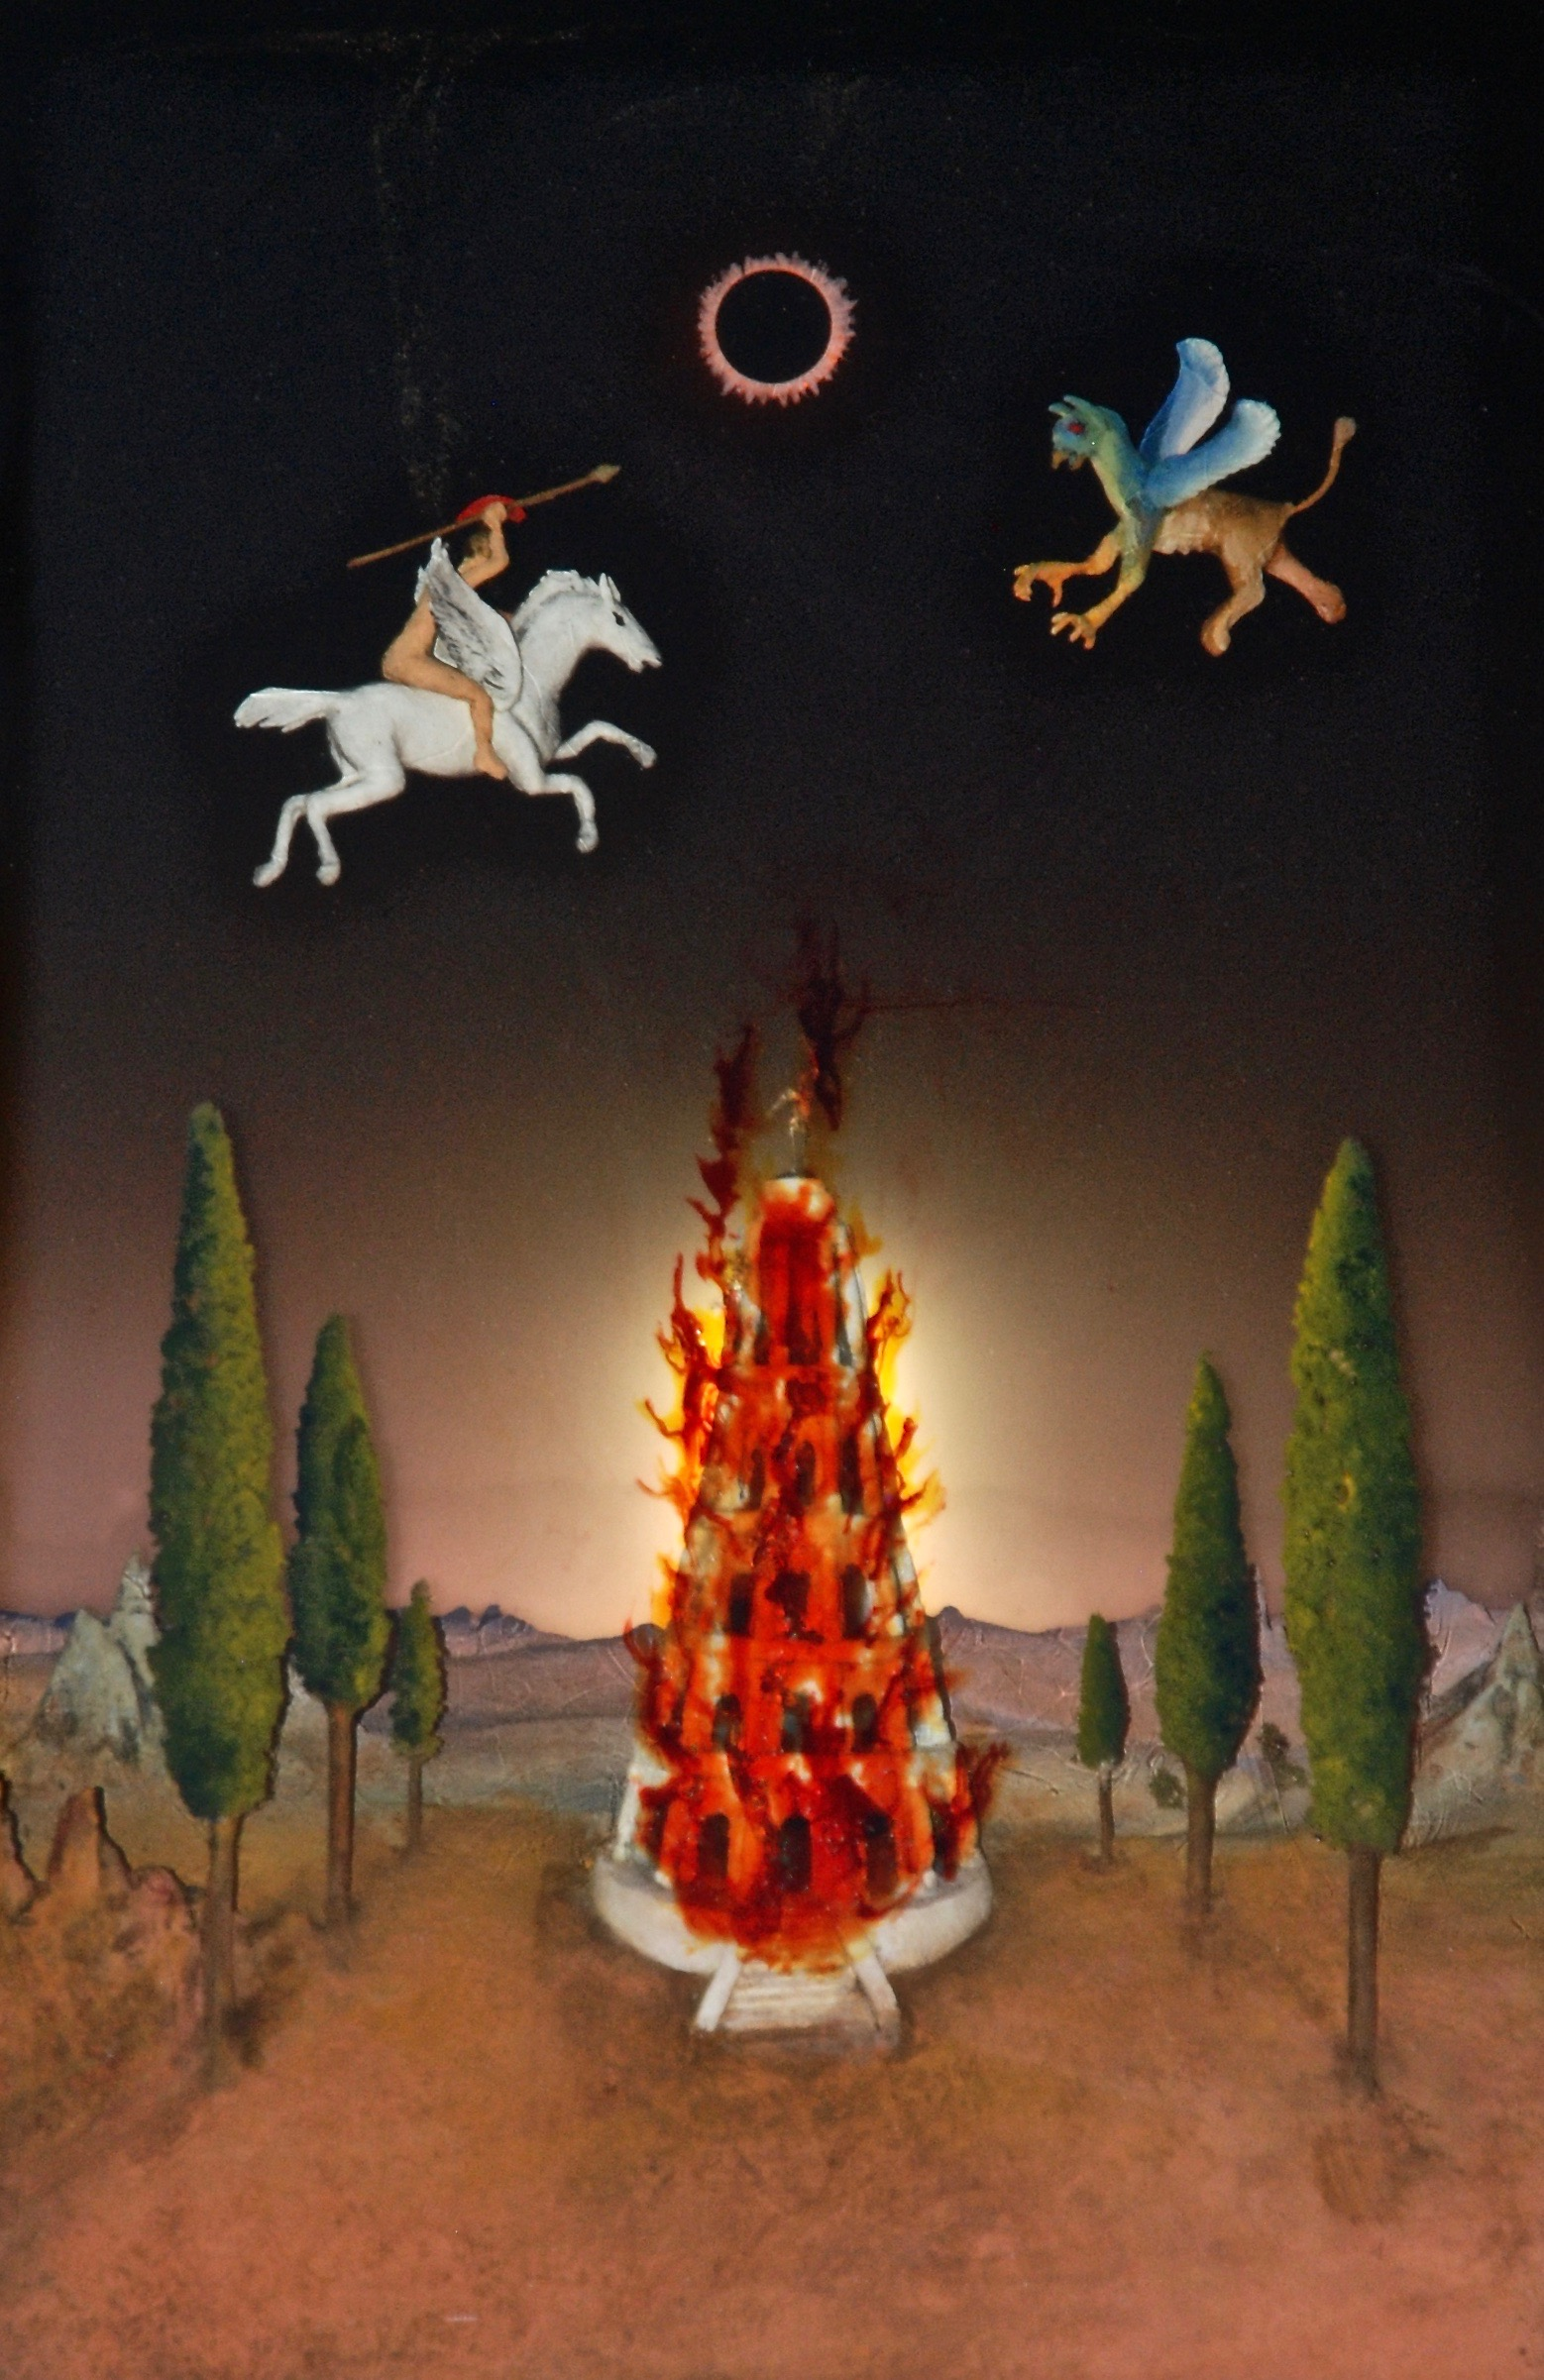 Thomas Coffin - Lunchtime in Babylon (embedded lighting detail)